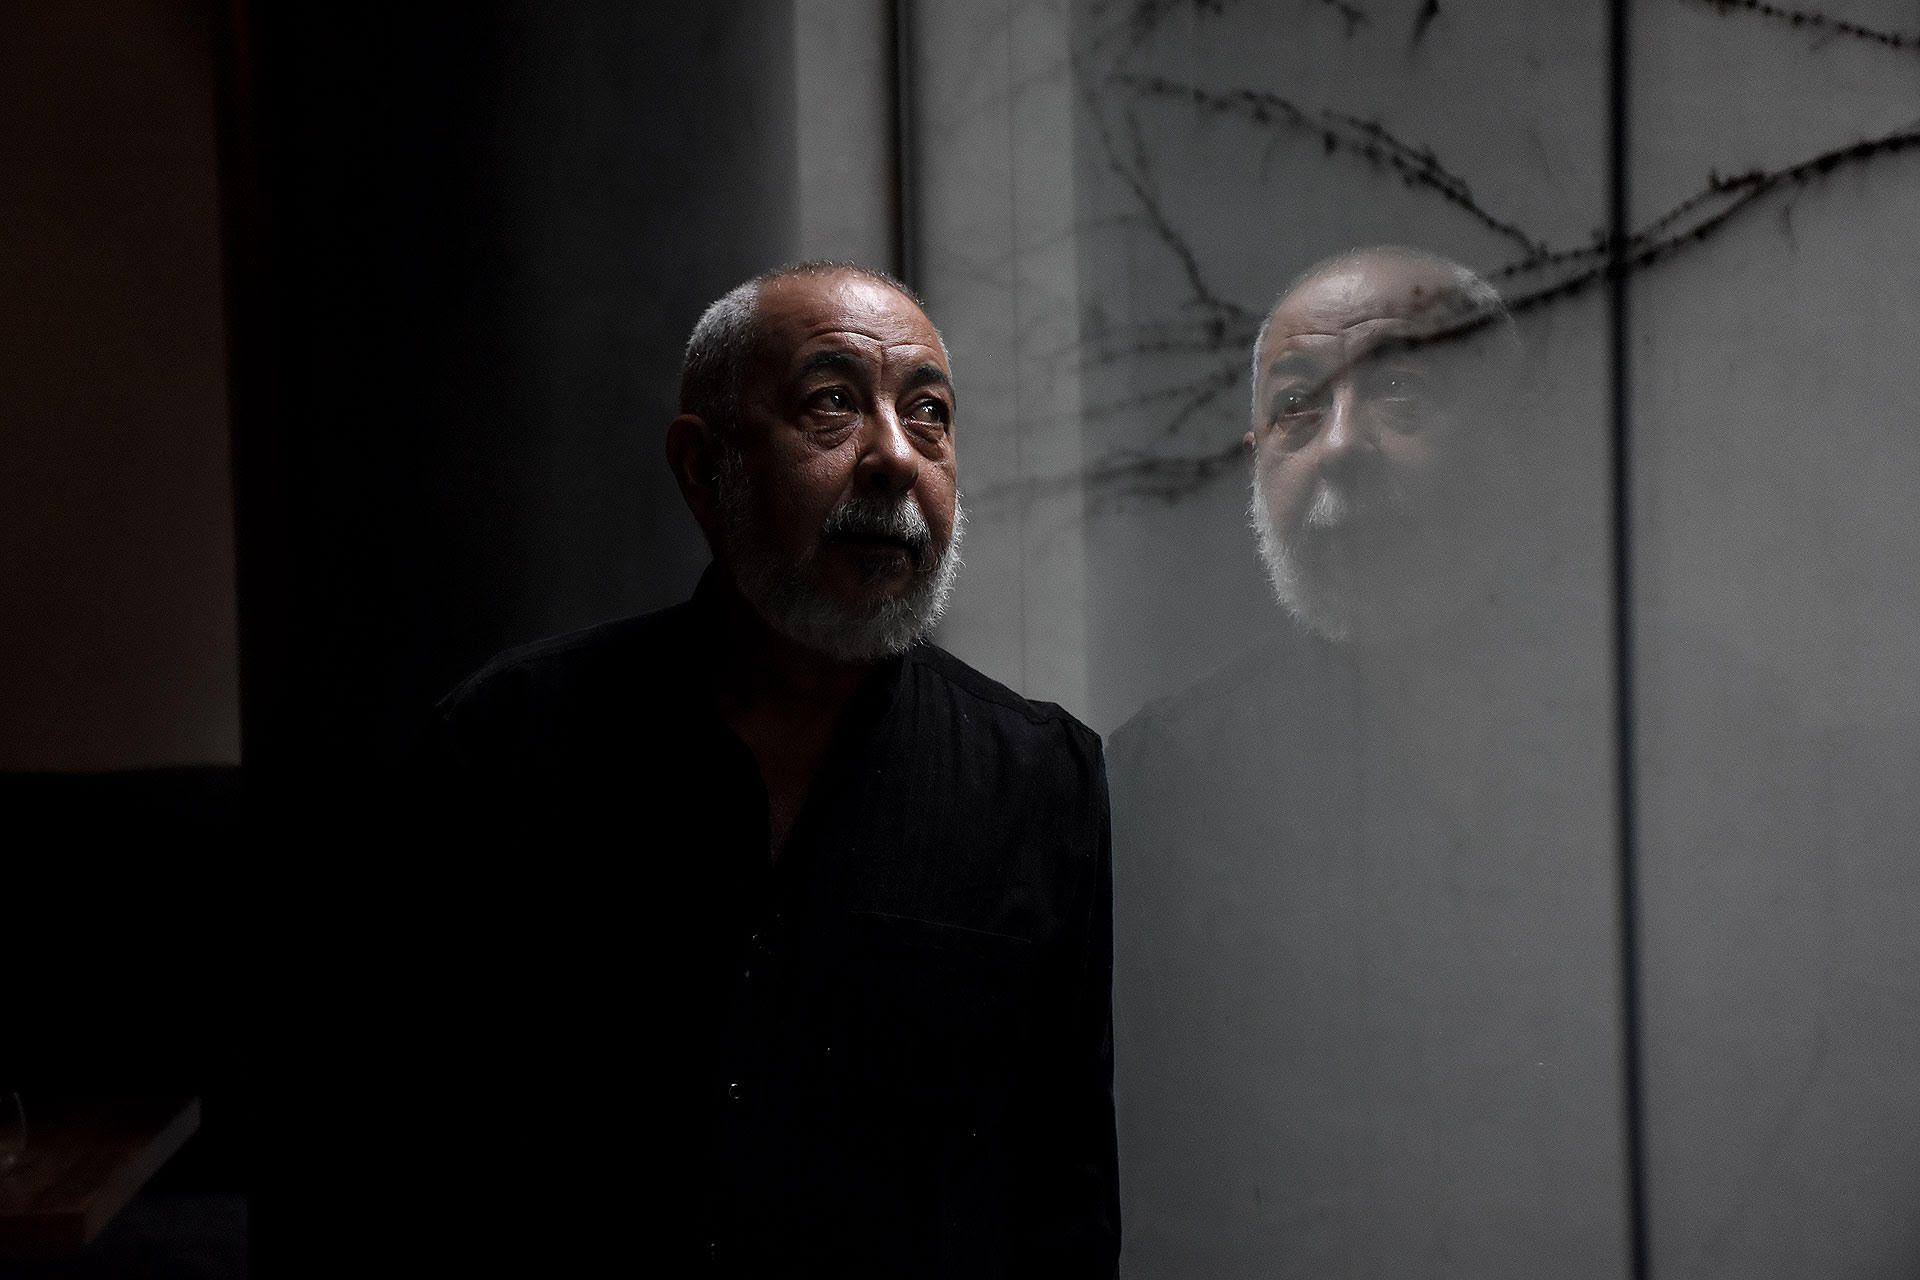 Retrato de Leonardo Padura, escritor cubano  - Crédito: Nicolás Stulberg